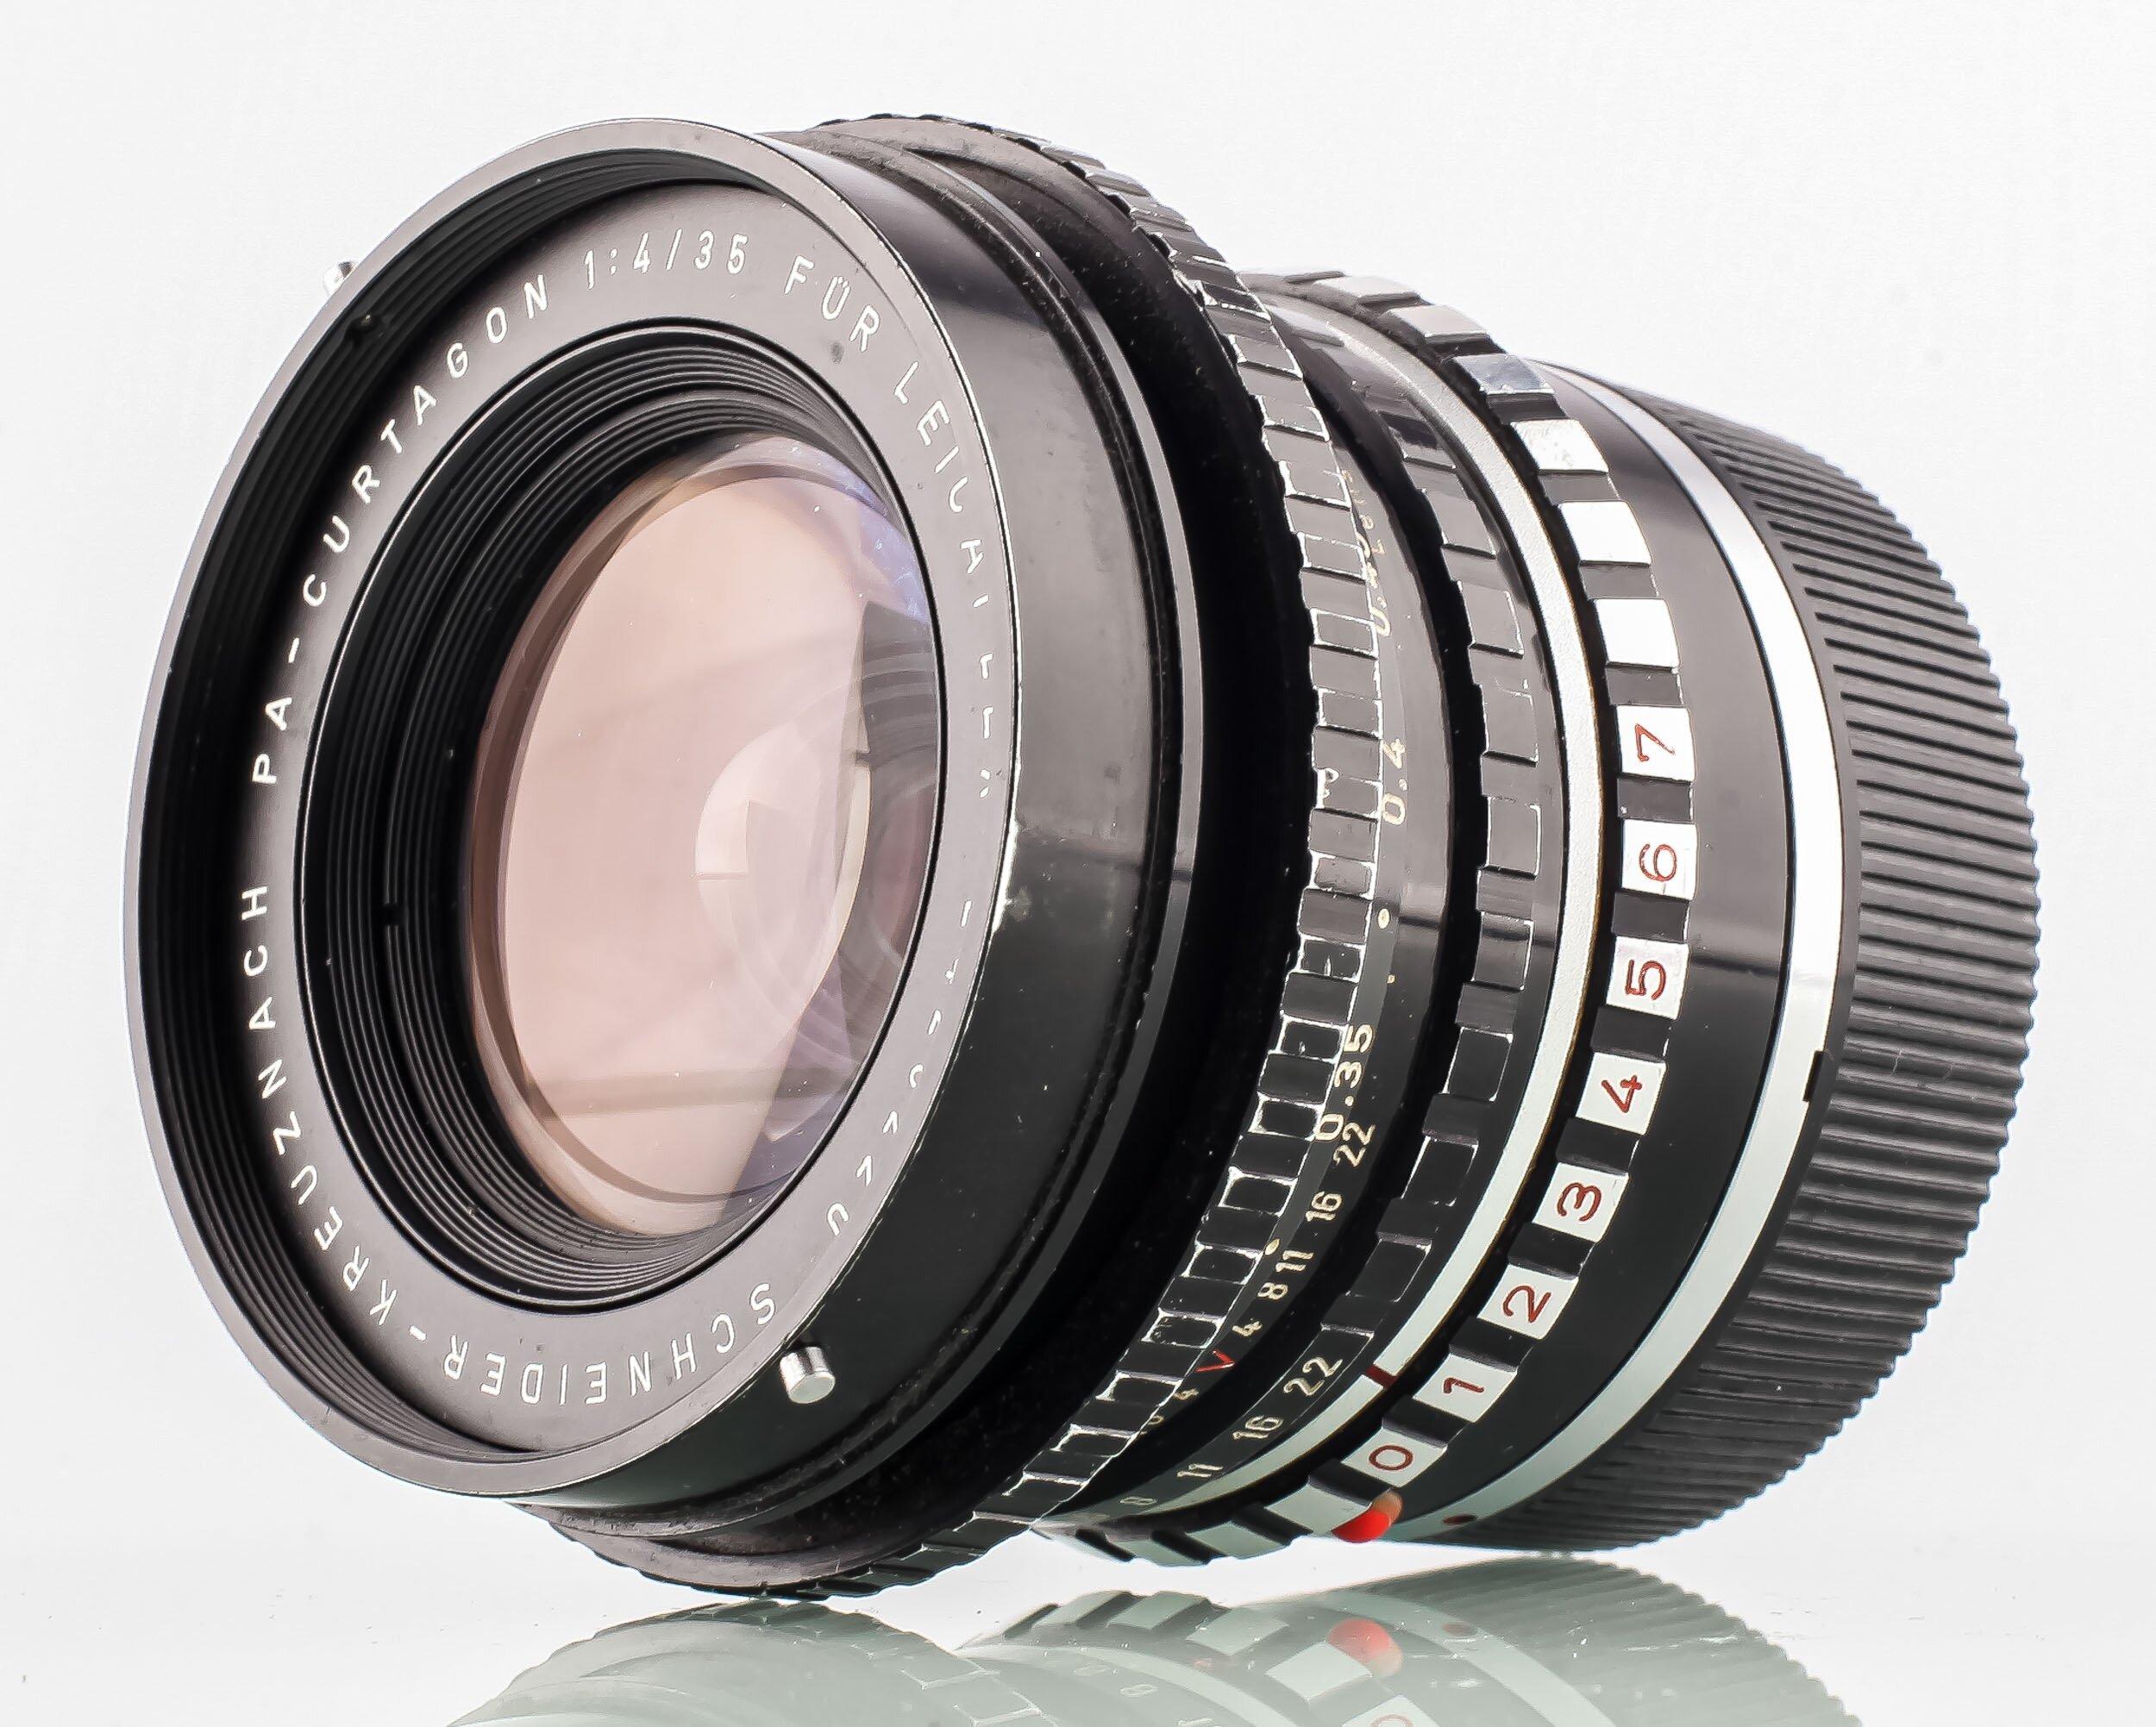 Schneider-Kreuznach PA-Curtagon 4/35mm for Leica R